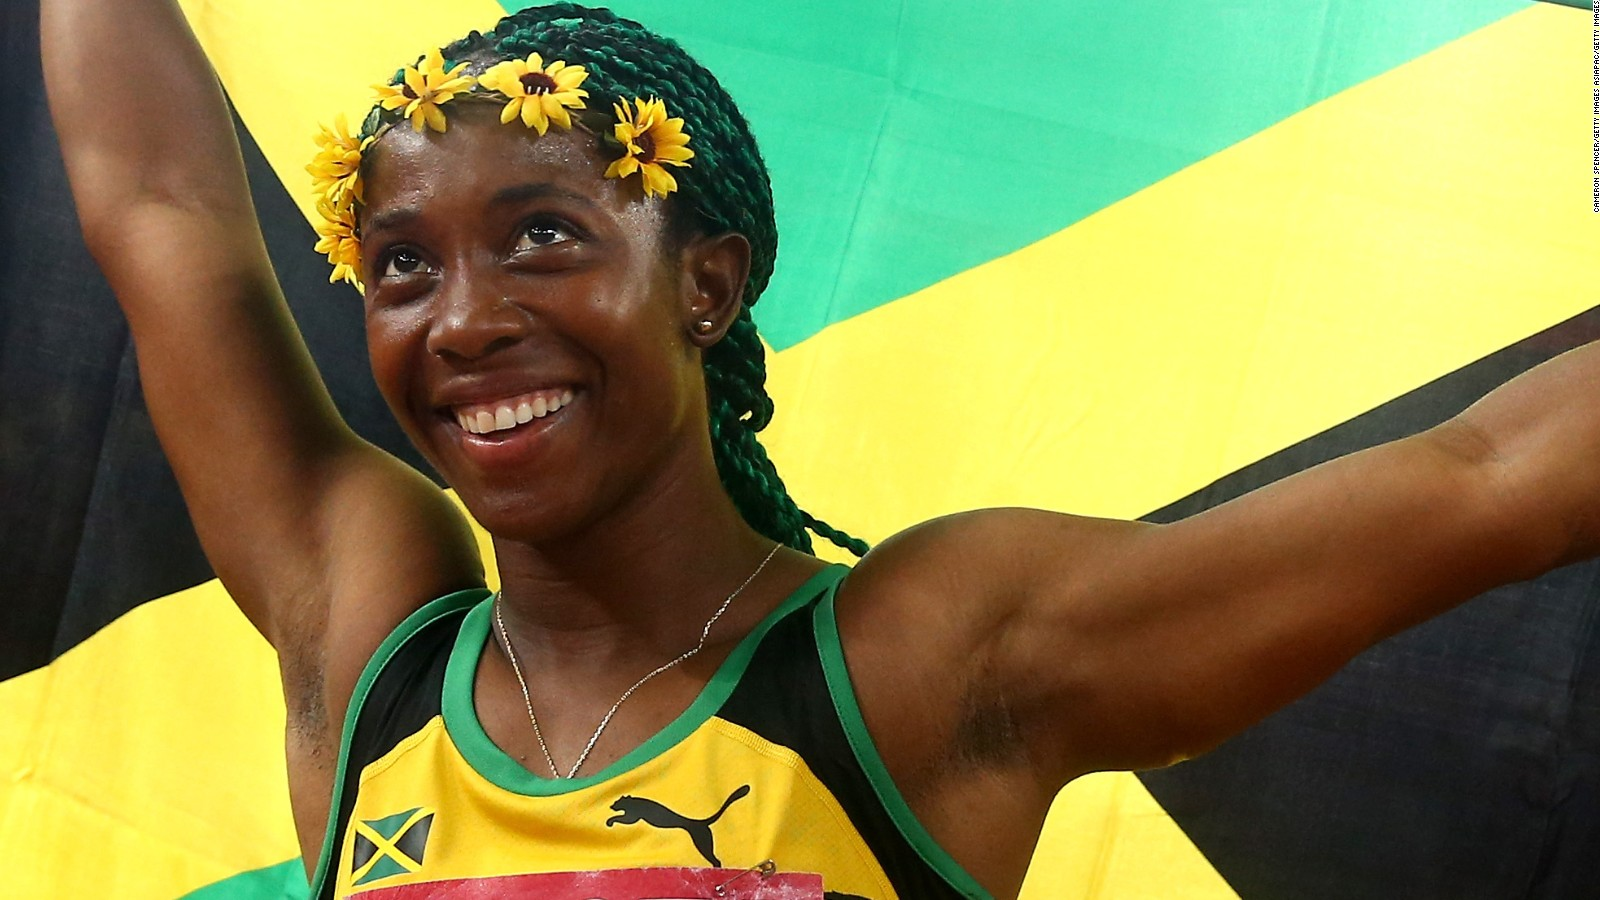 Shelly Ann Fraser Pryce And Usain Bolt